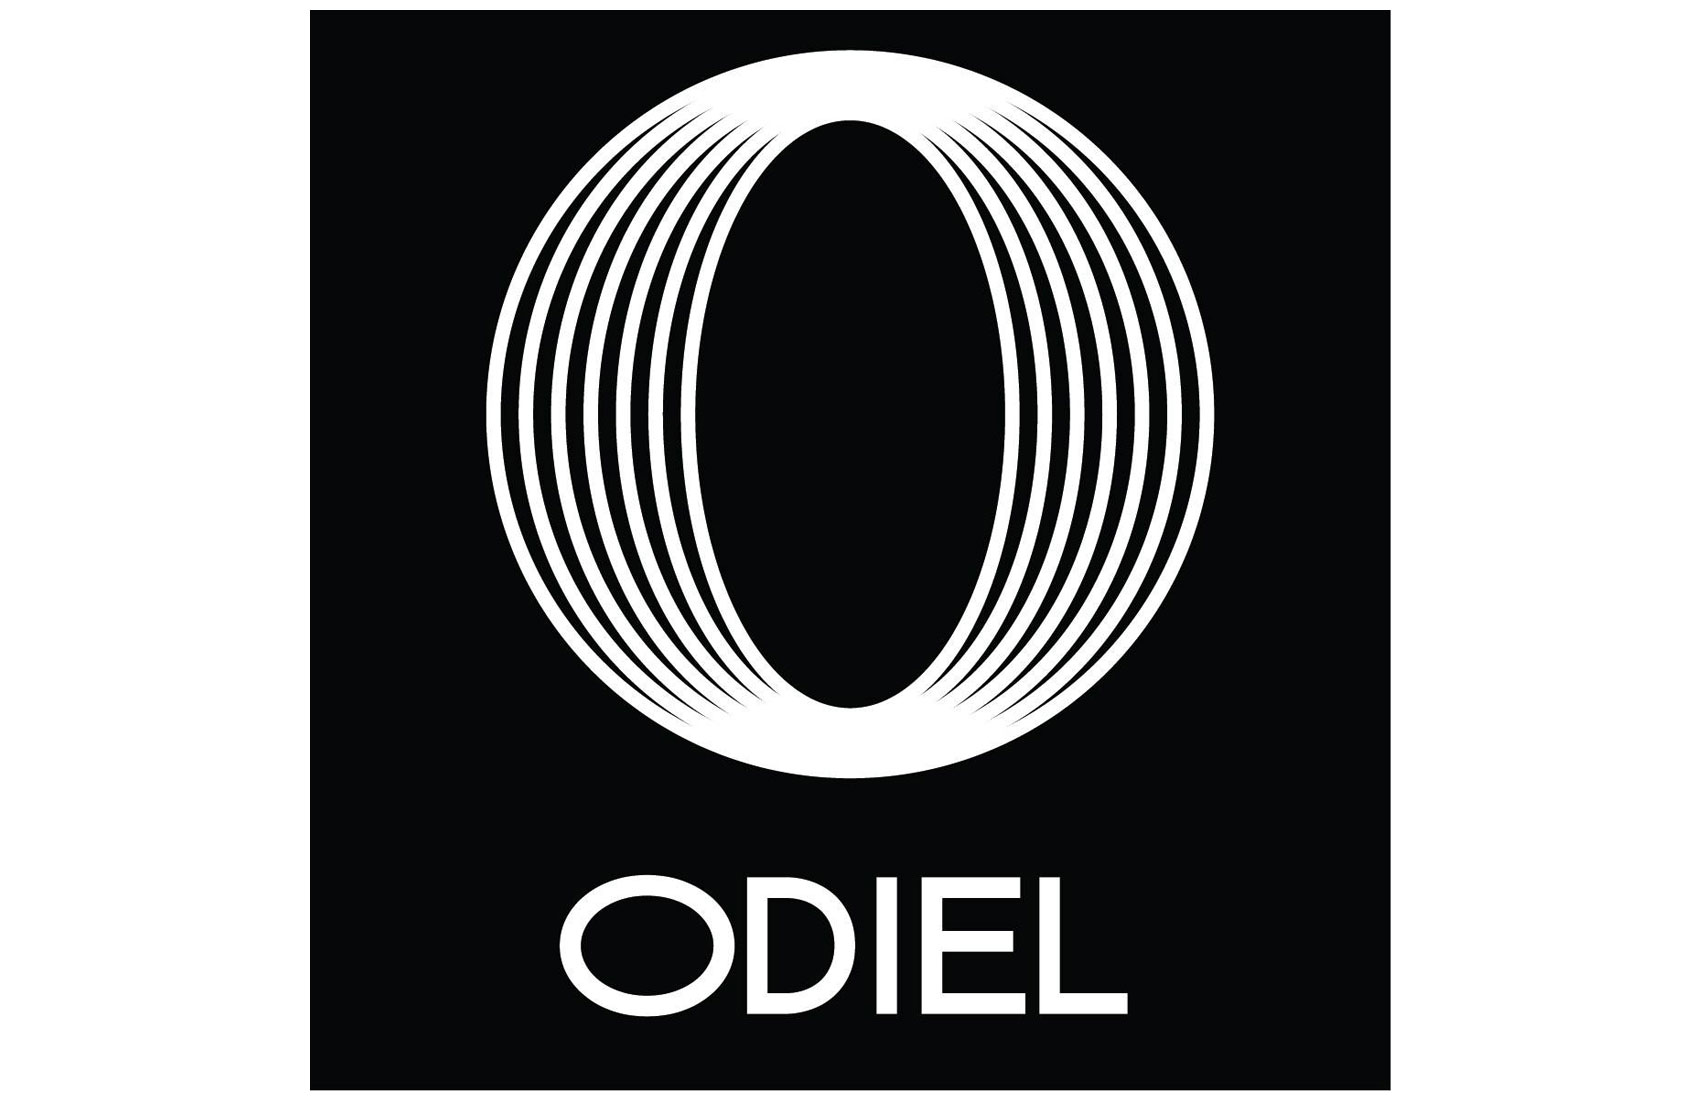 Odiel